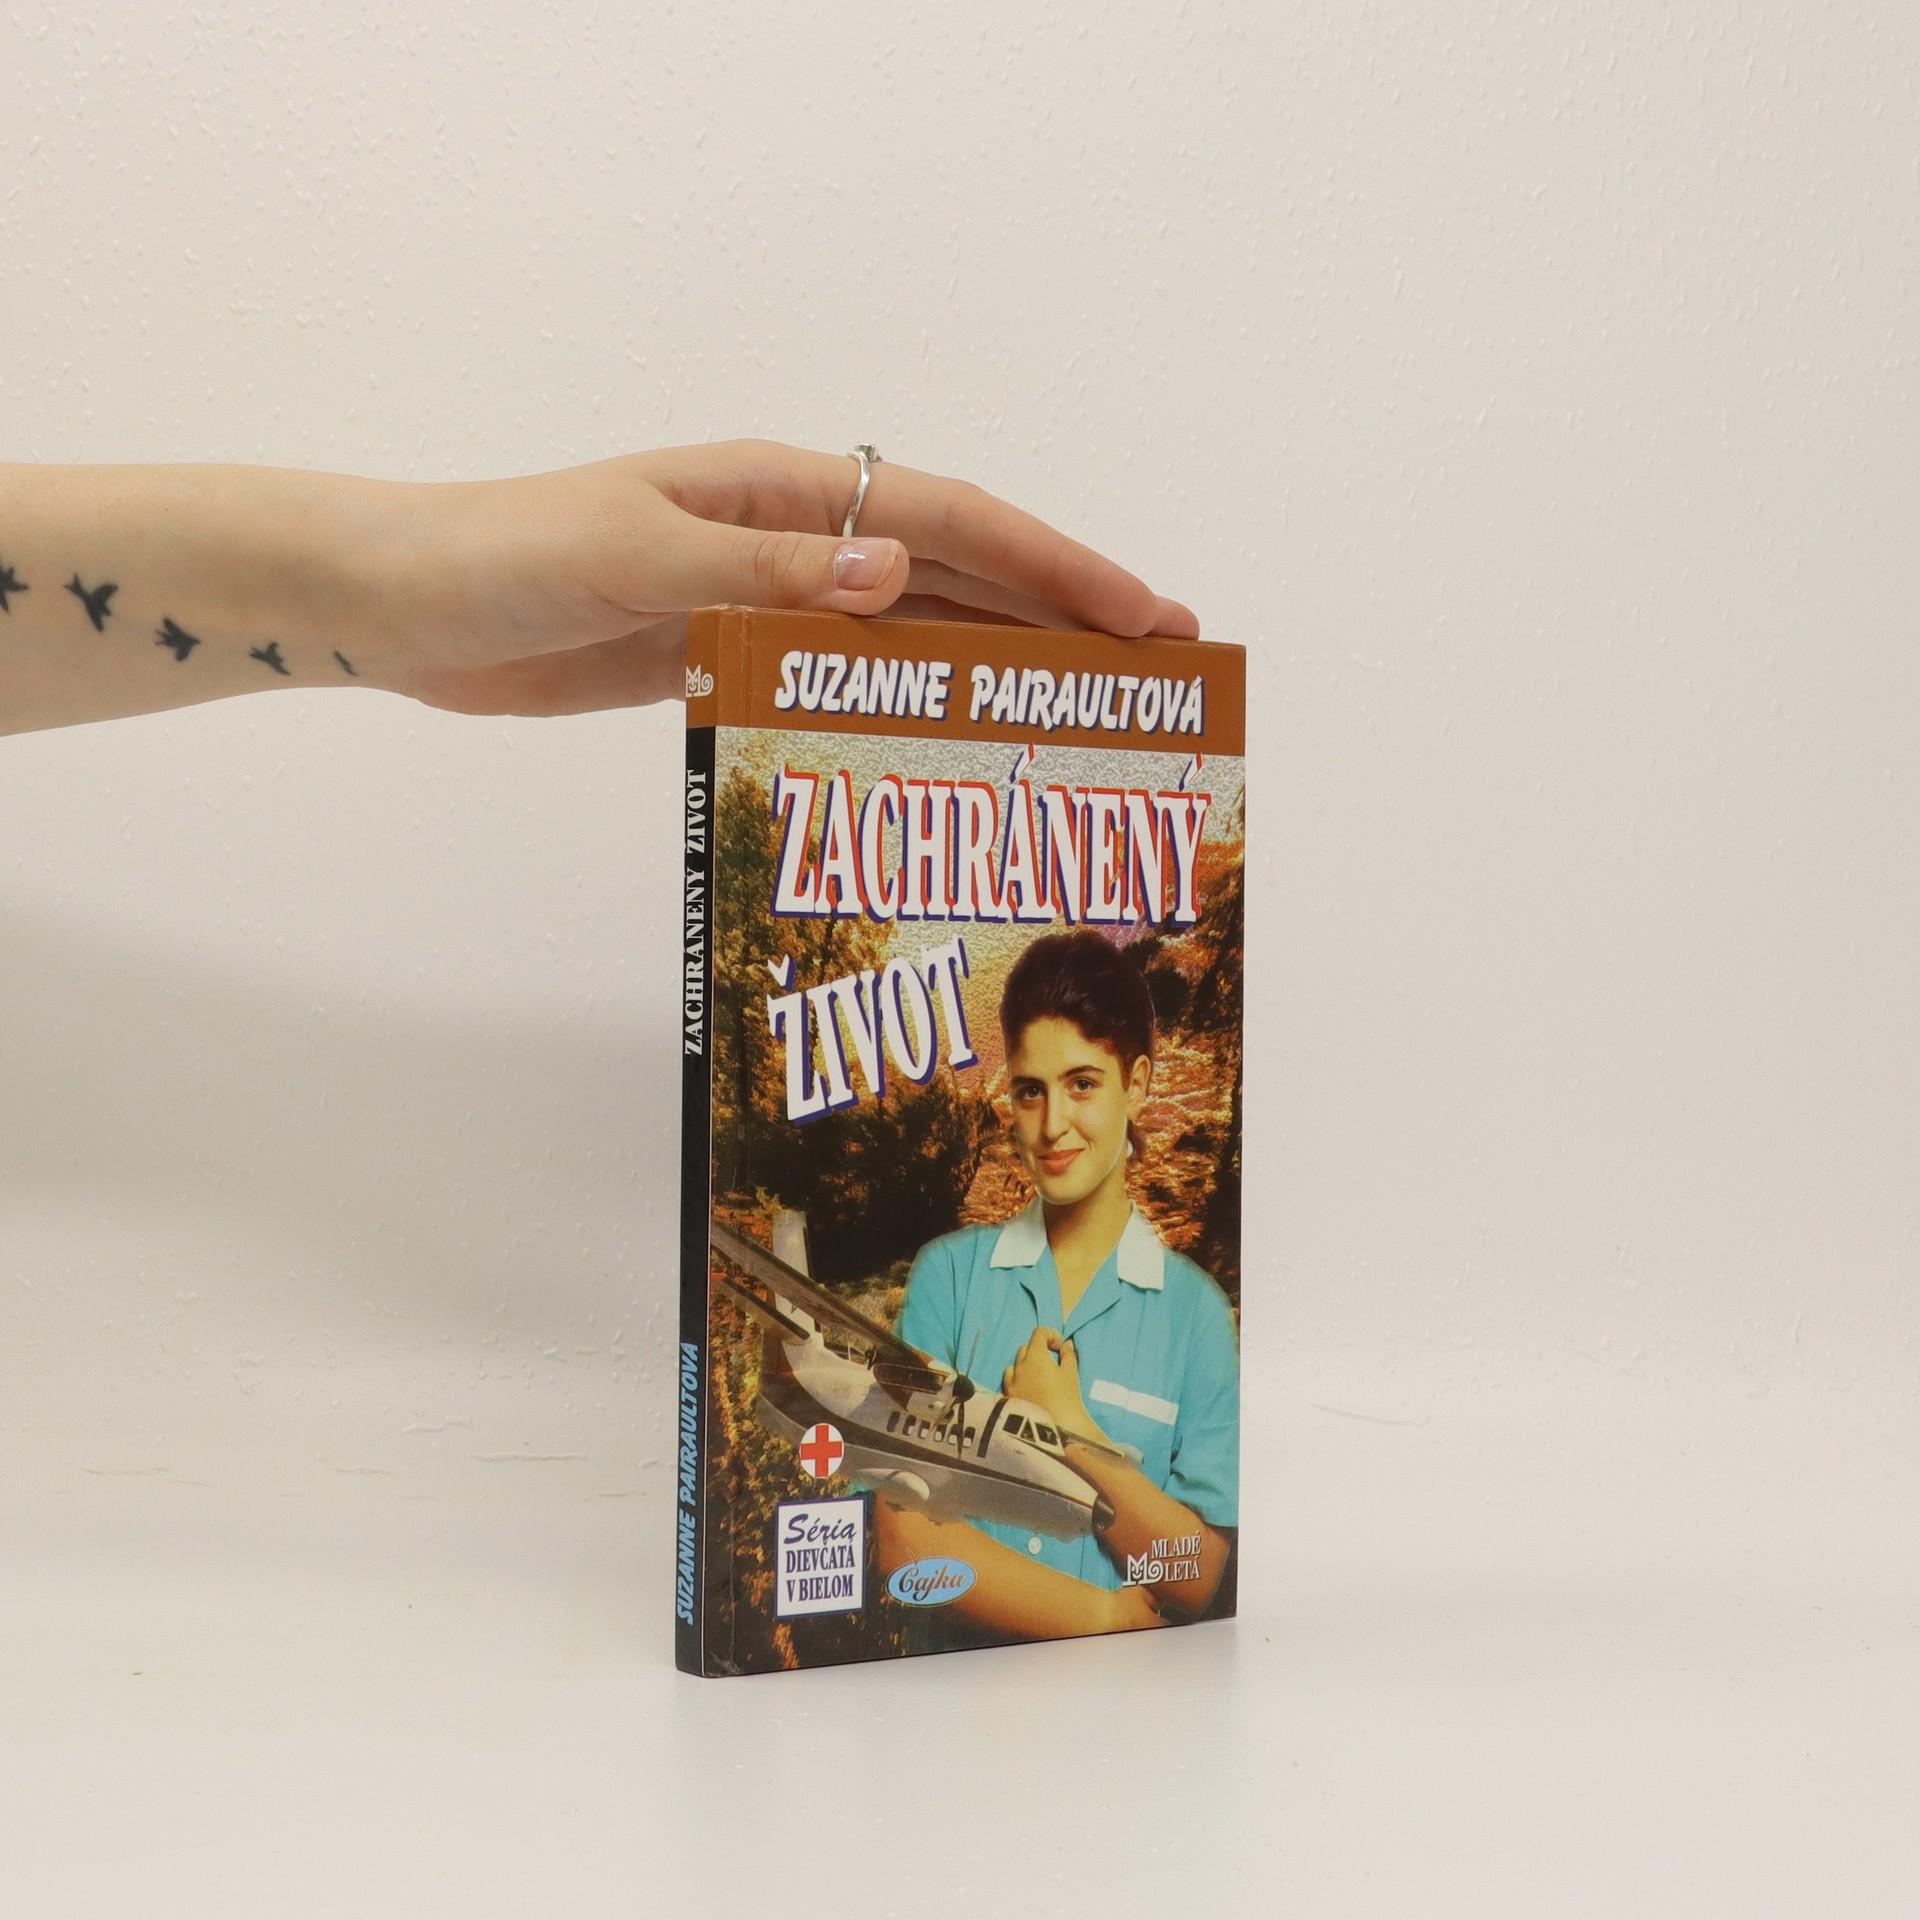 antikvární kniha Zachránený život, 1995